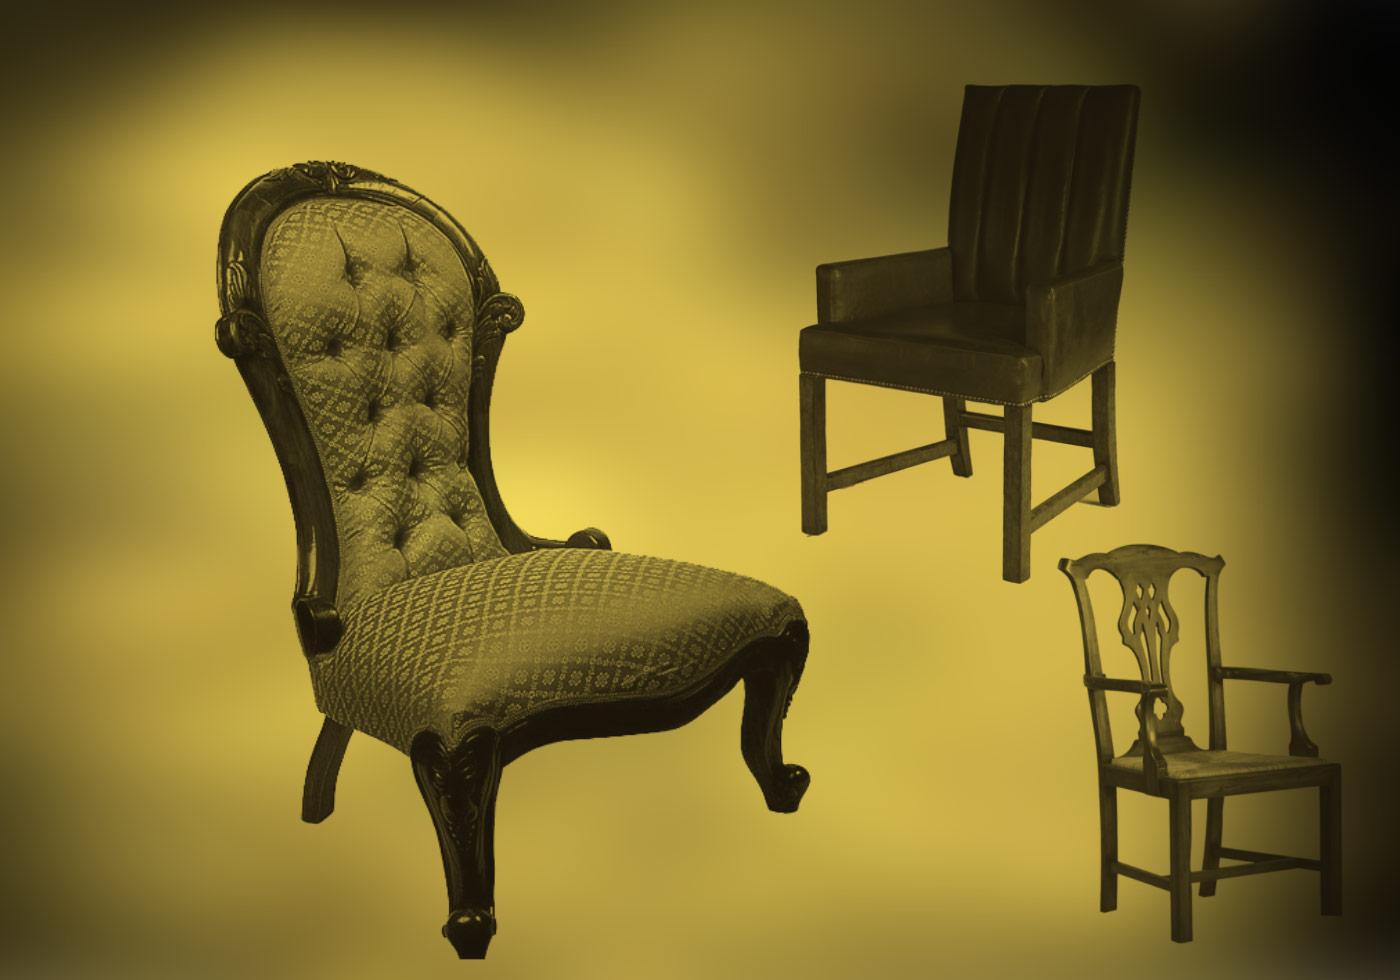 Vintage Chairs Brush Set  Free Photoshop Brushes at